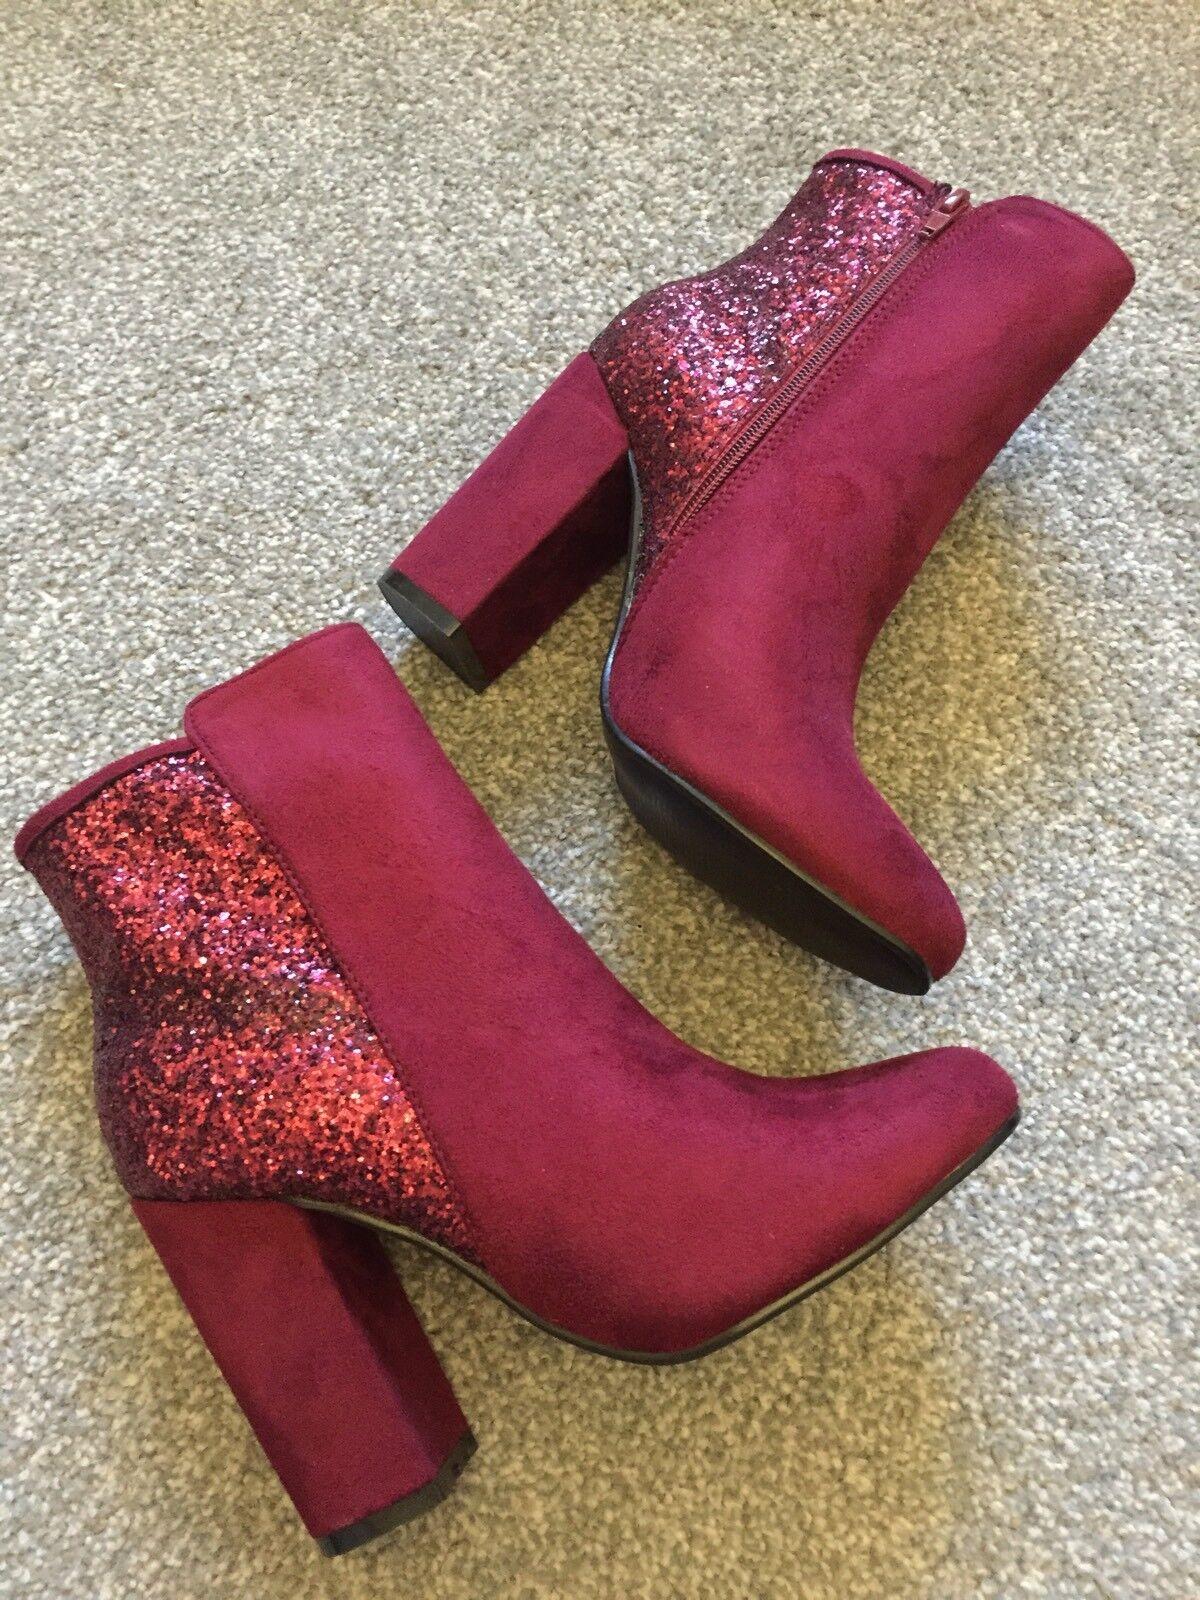 BNIB Ladies Divine Glitter Block Heel Magenta Burgundy Sock Ankle Boots UK 7